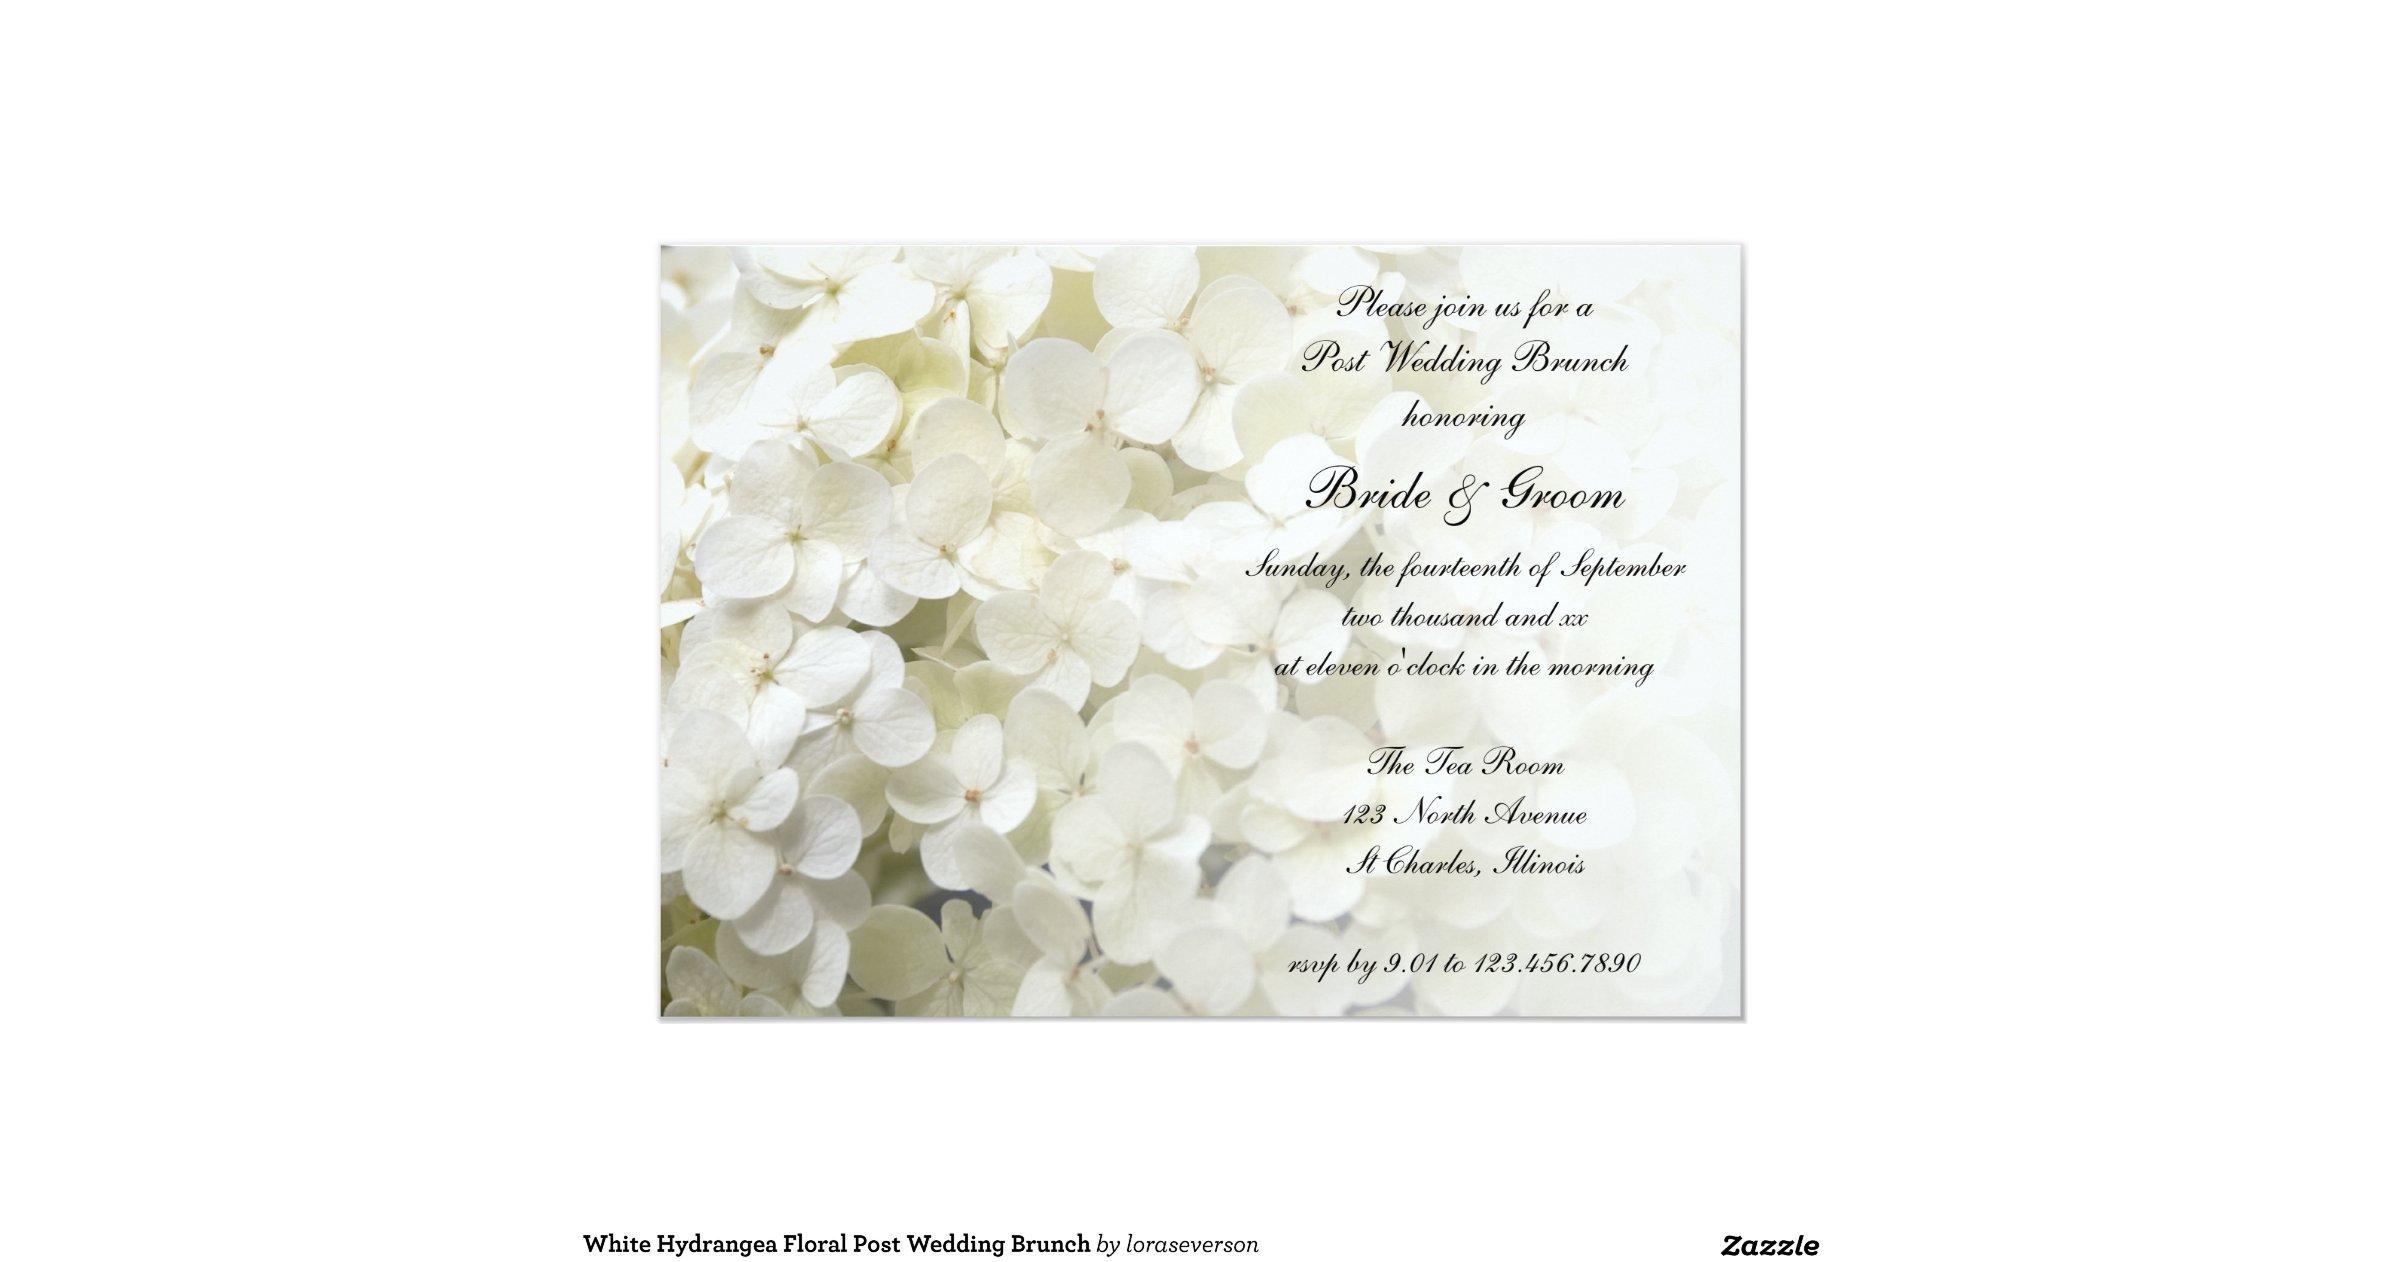 White Hydrangea Post Wedding Brunch Invitation R9d6a9338b27f484188e3db2a322d1896 Zkrqs 1200